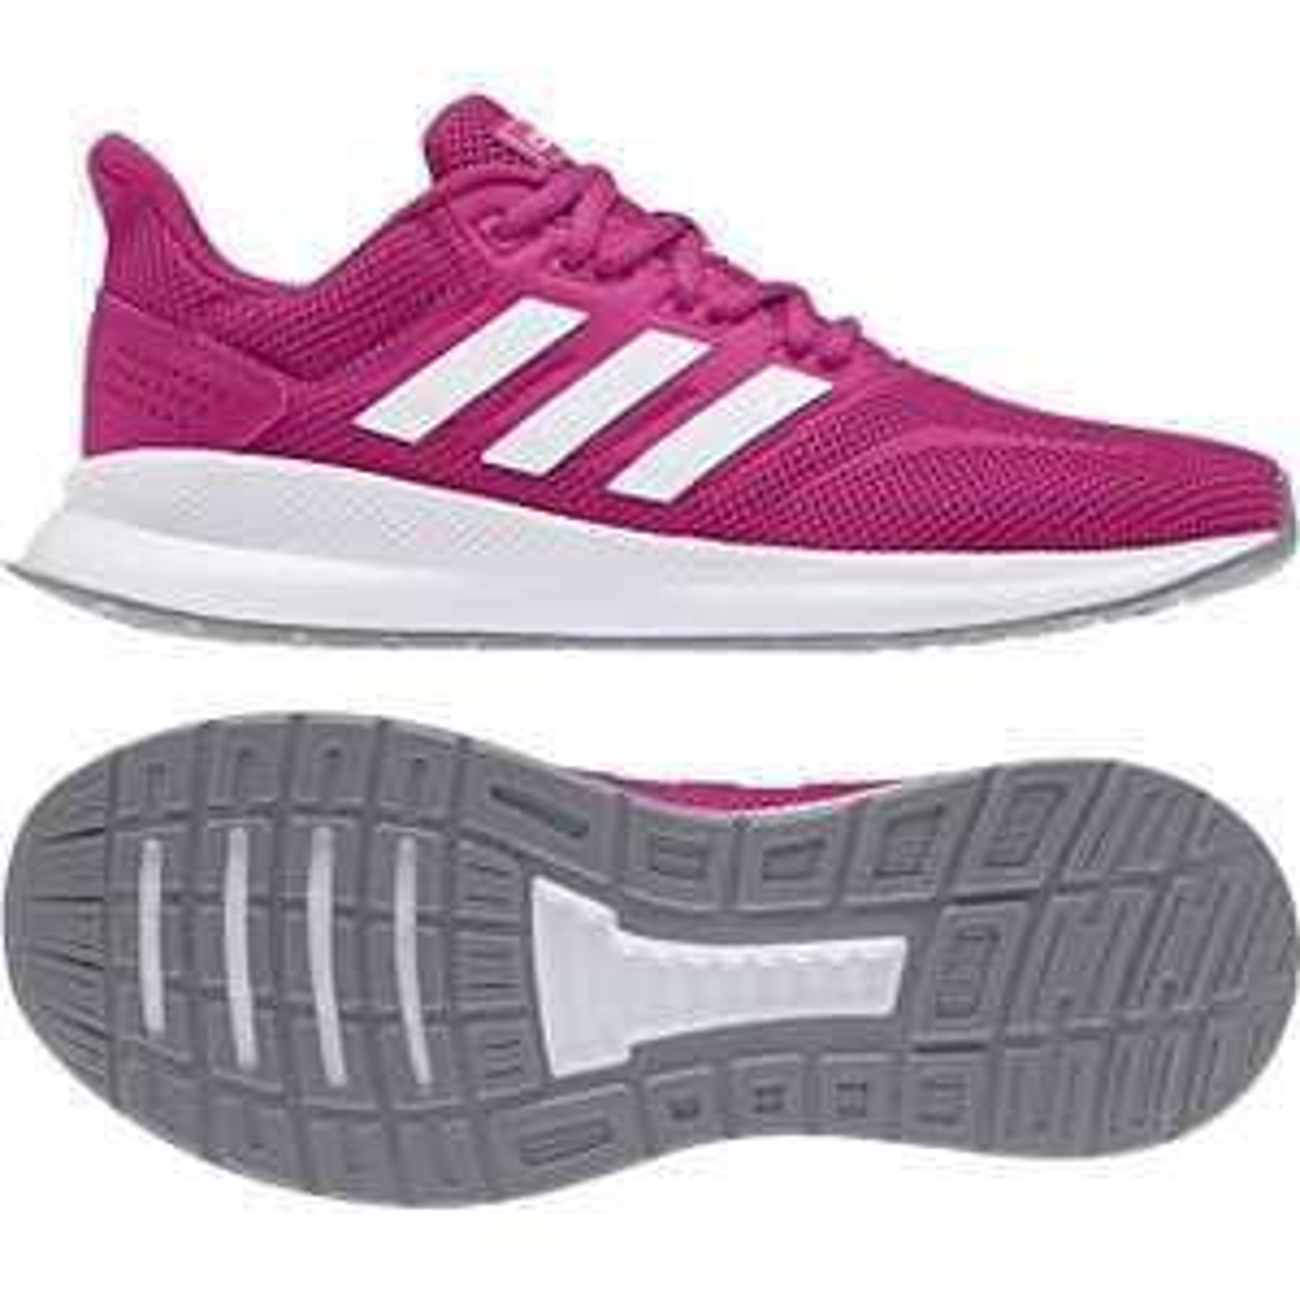 Chaussures de Running Adidas Falcon - Rose, Du 36 au 41 1/3